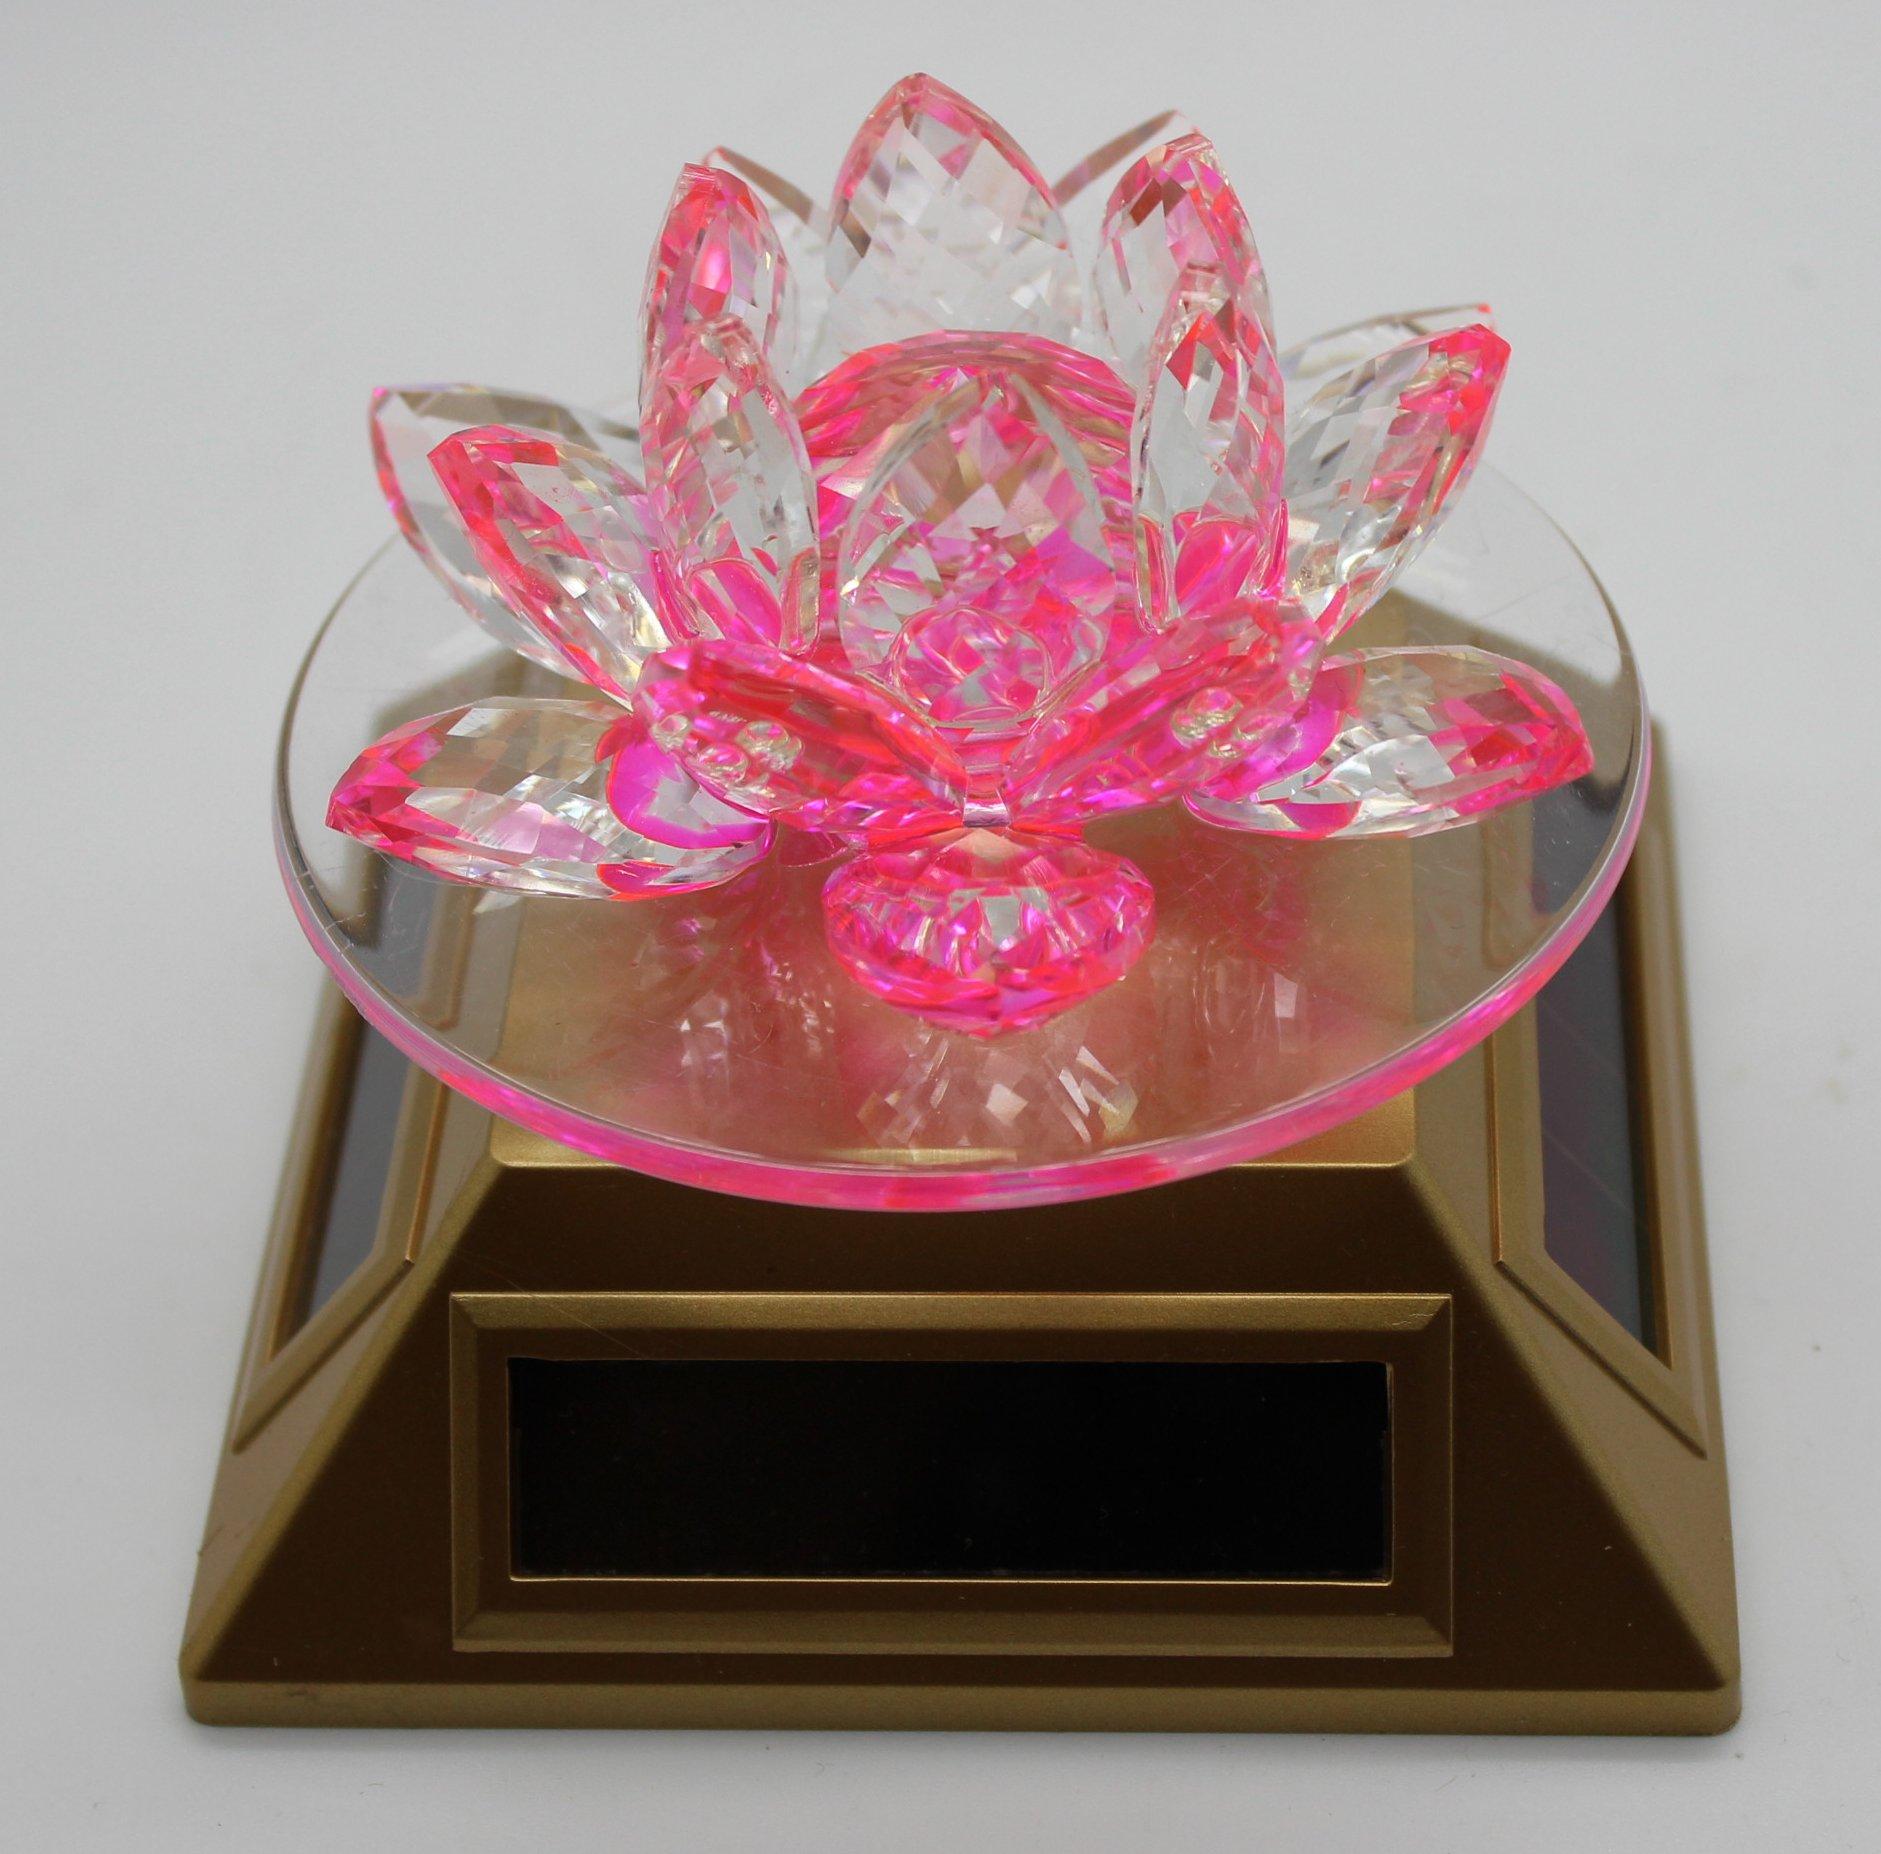 Lotus Crystal Flower - Solar Powered - Pink